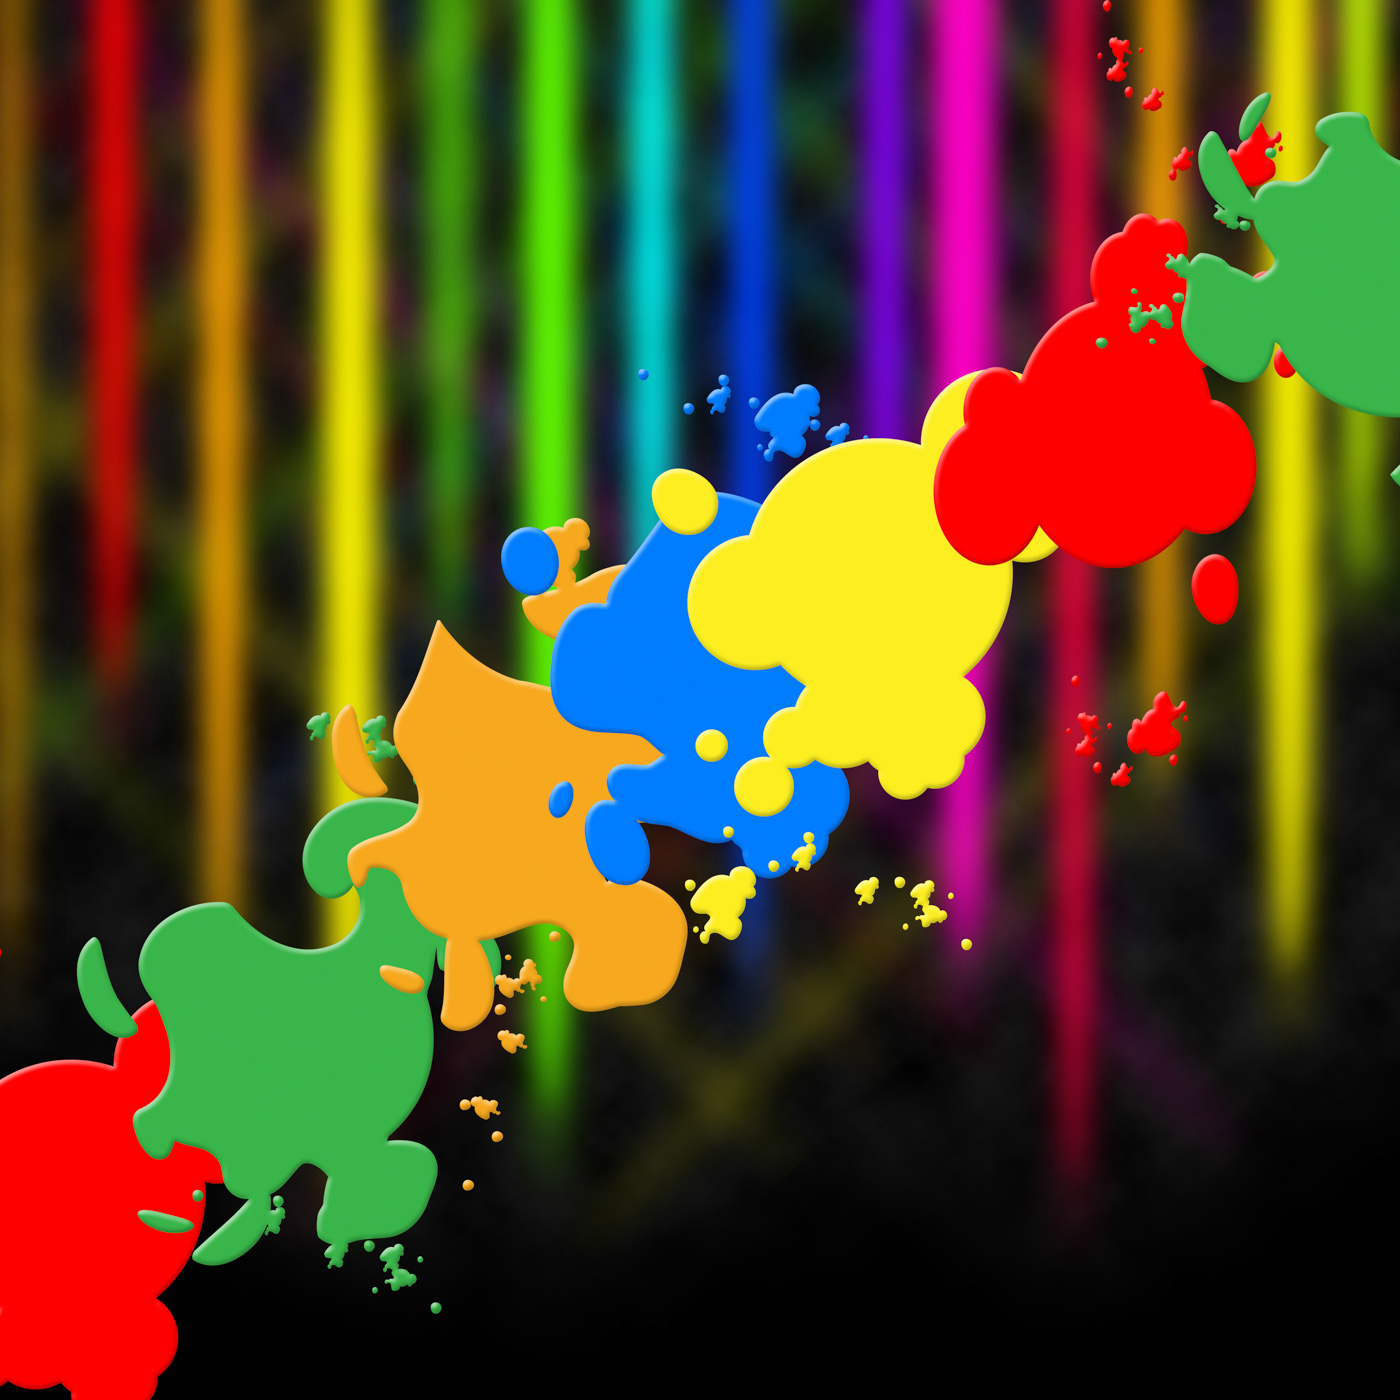 Paint splash means splat splashed and design photo